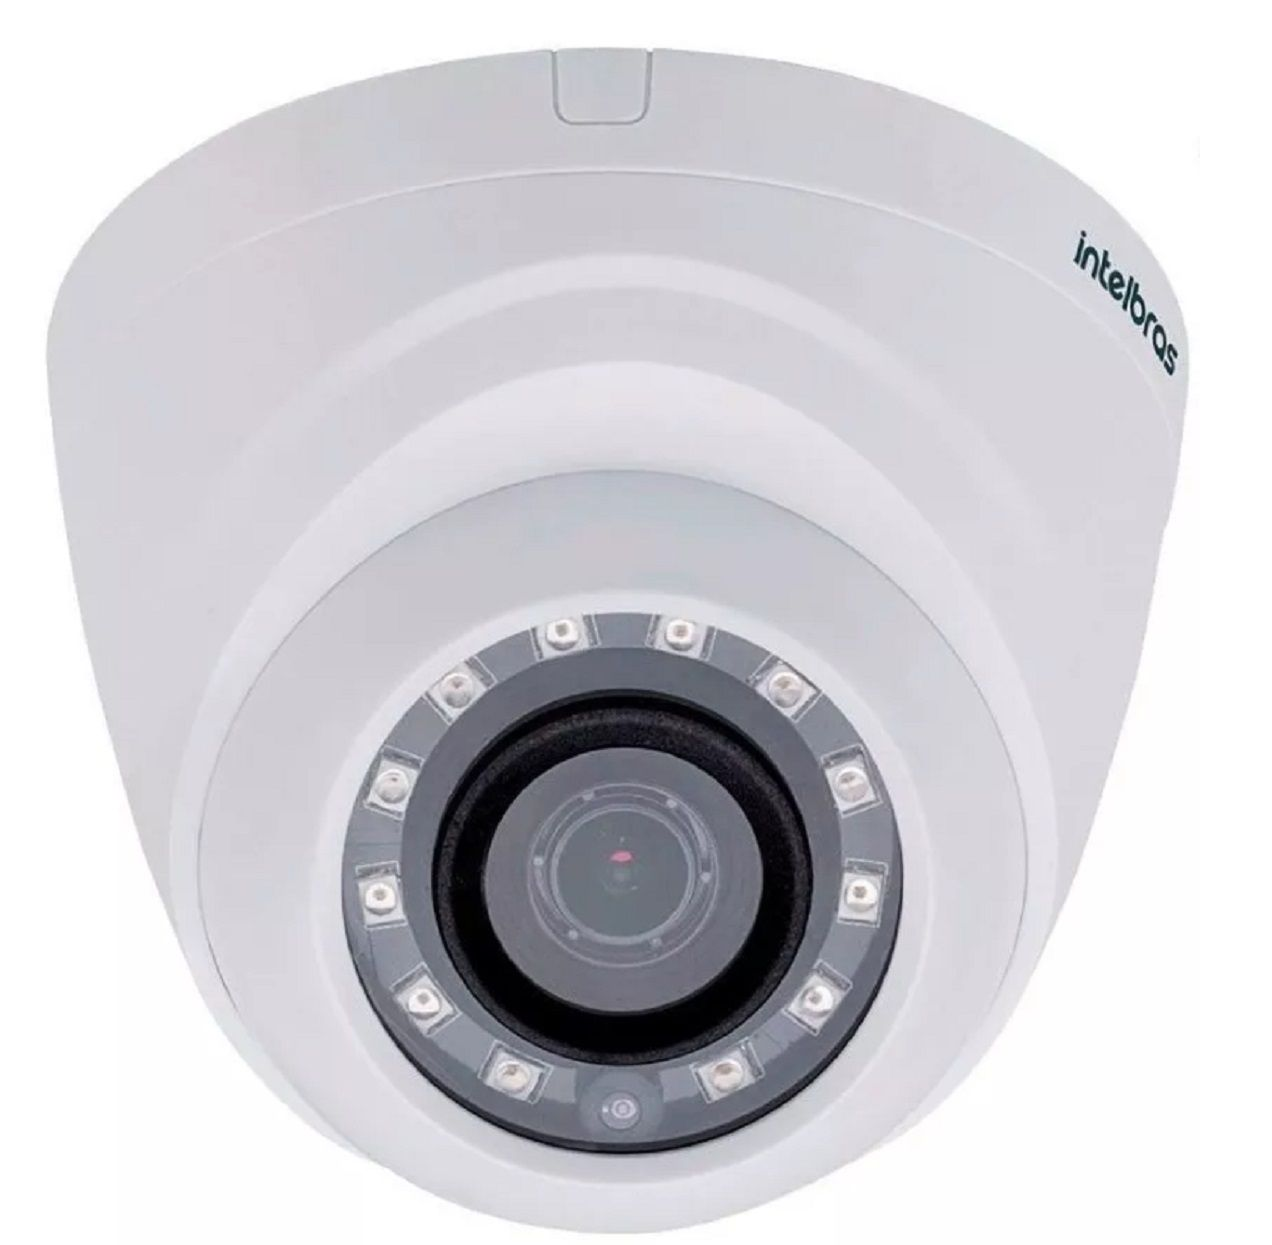 Câmera Dome Full Hd Infra Multi Hd Intelbras Vhd 1220d